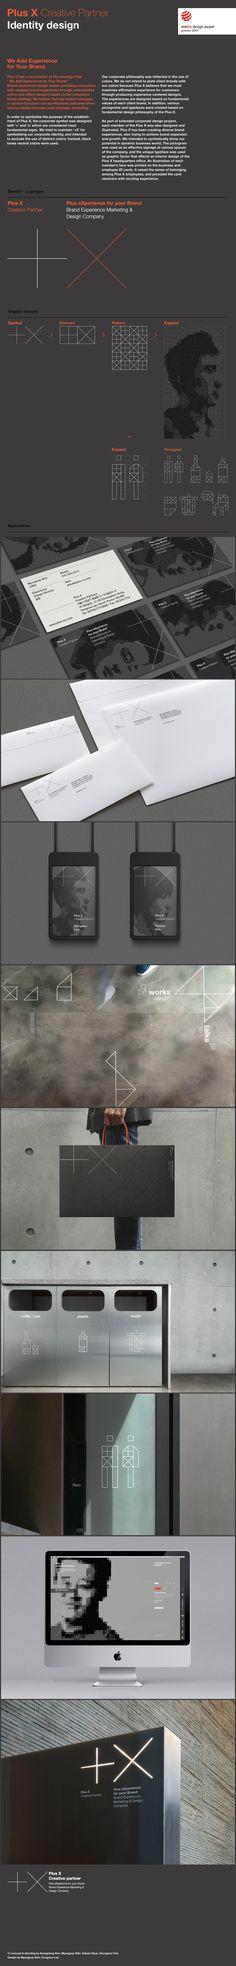 Plus X Creative Partner Identity Design on Behance